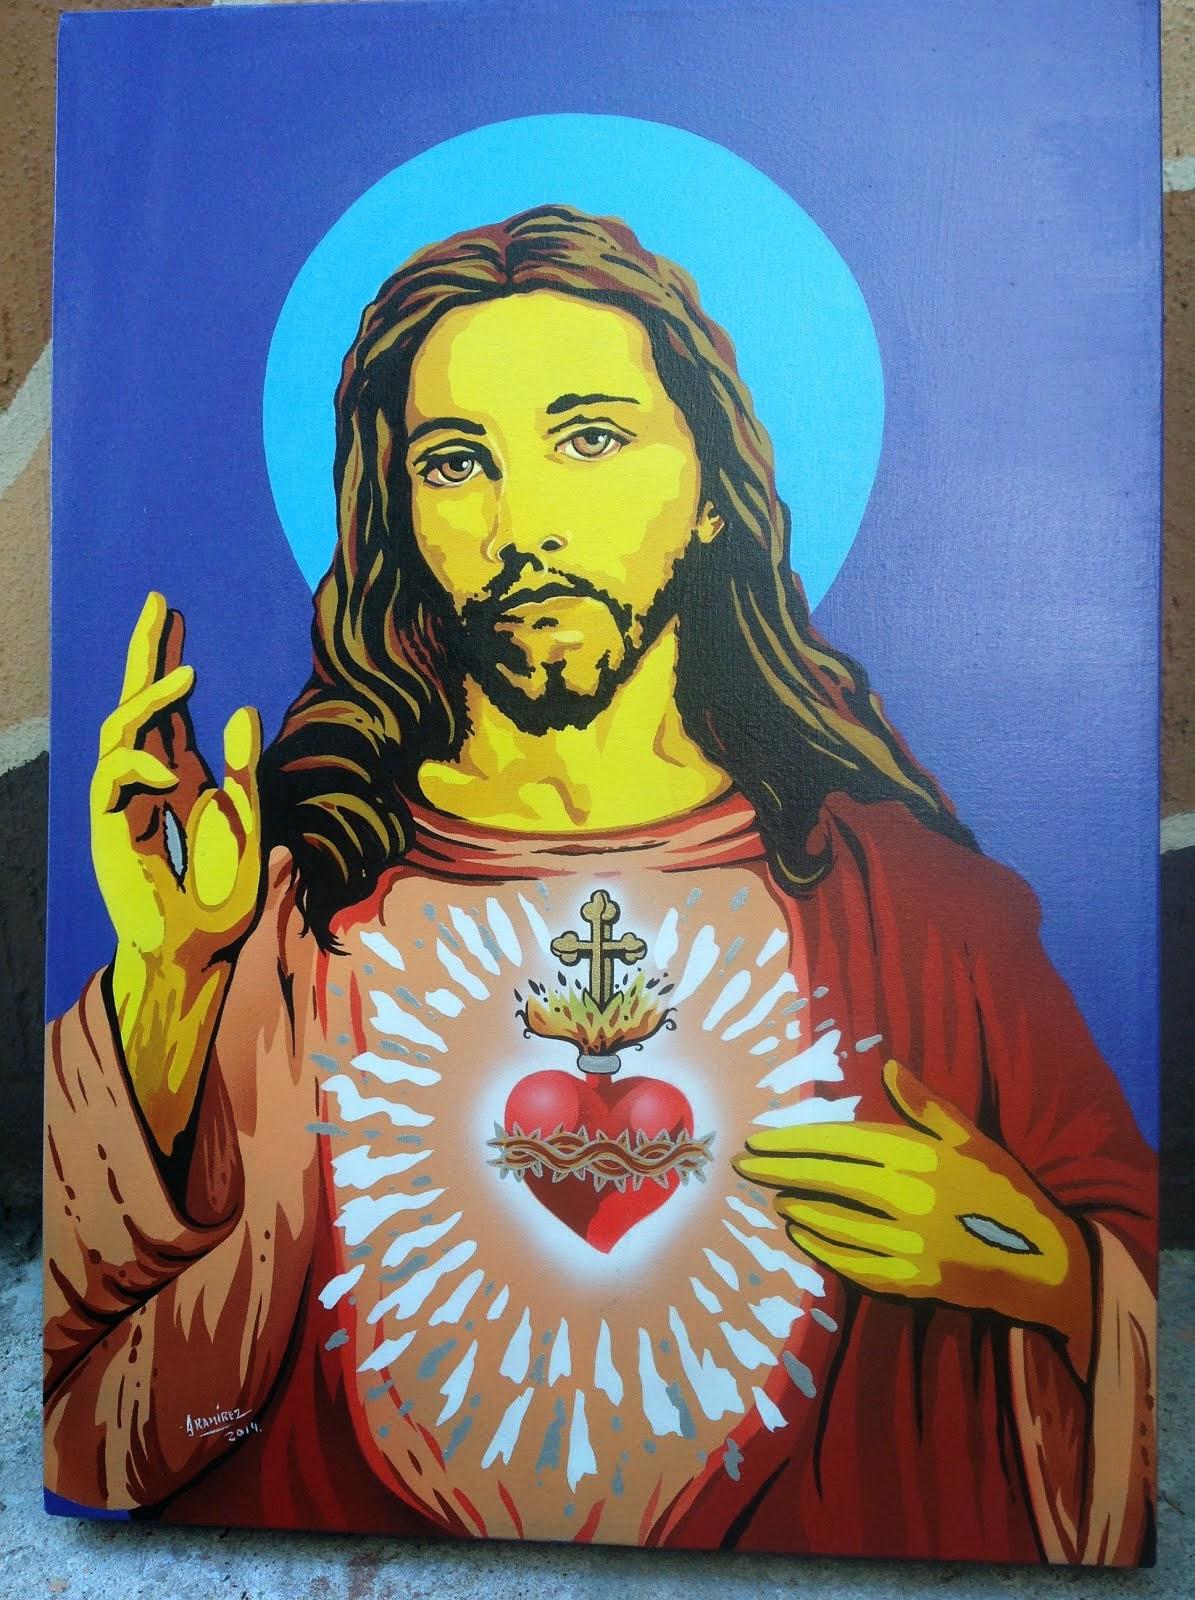 CUADRO RELIGIOSO EN ARTE POP